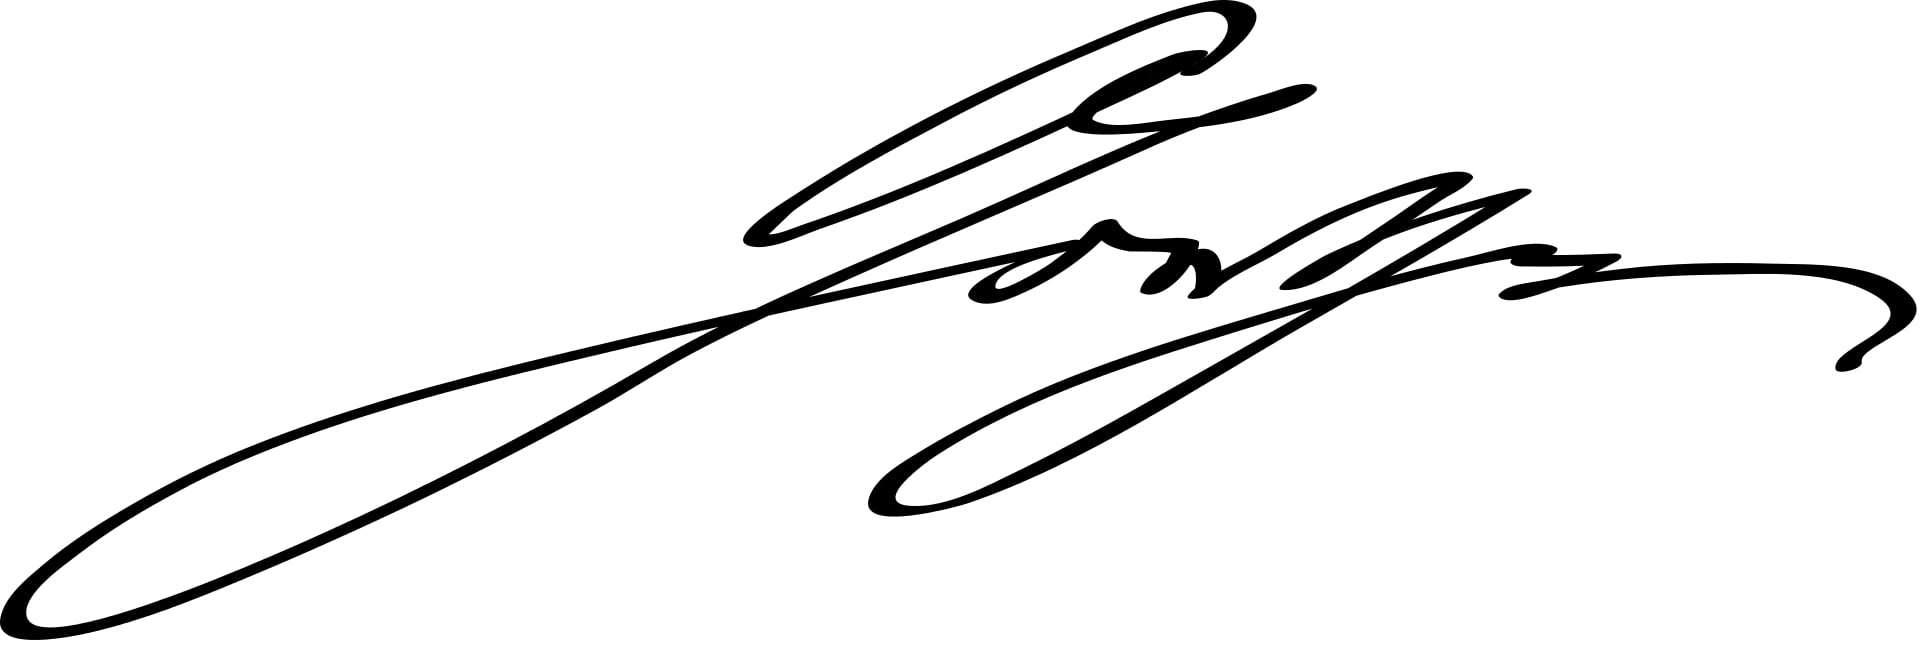 Johann Wolfgang von Goethe Signature